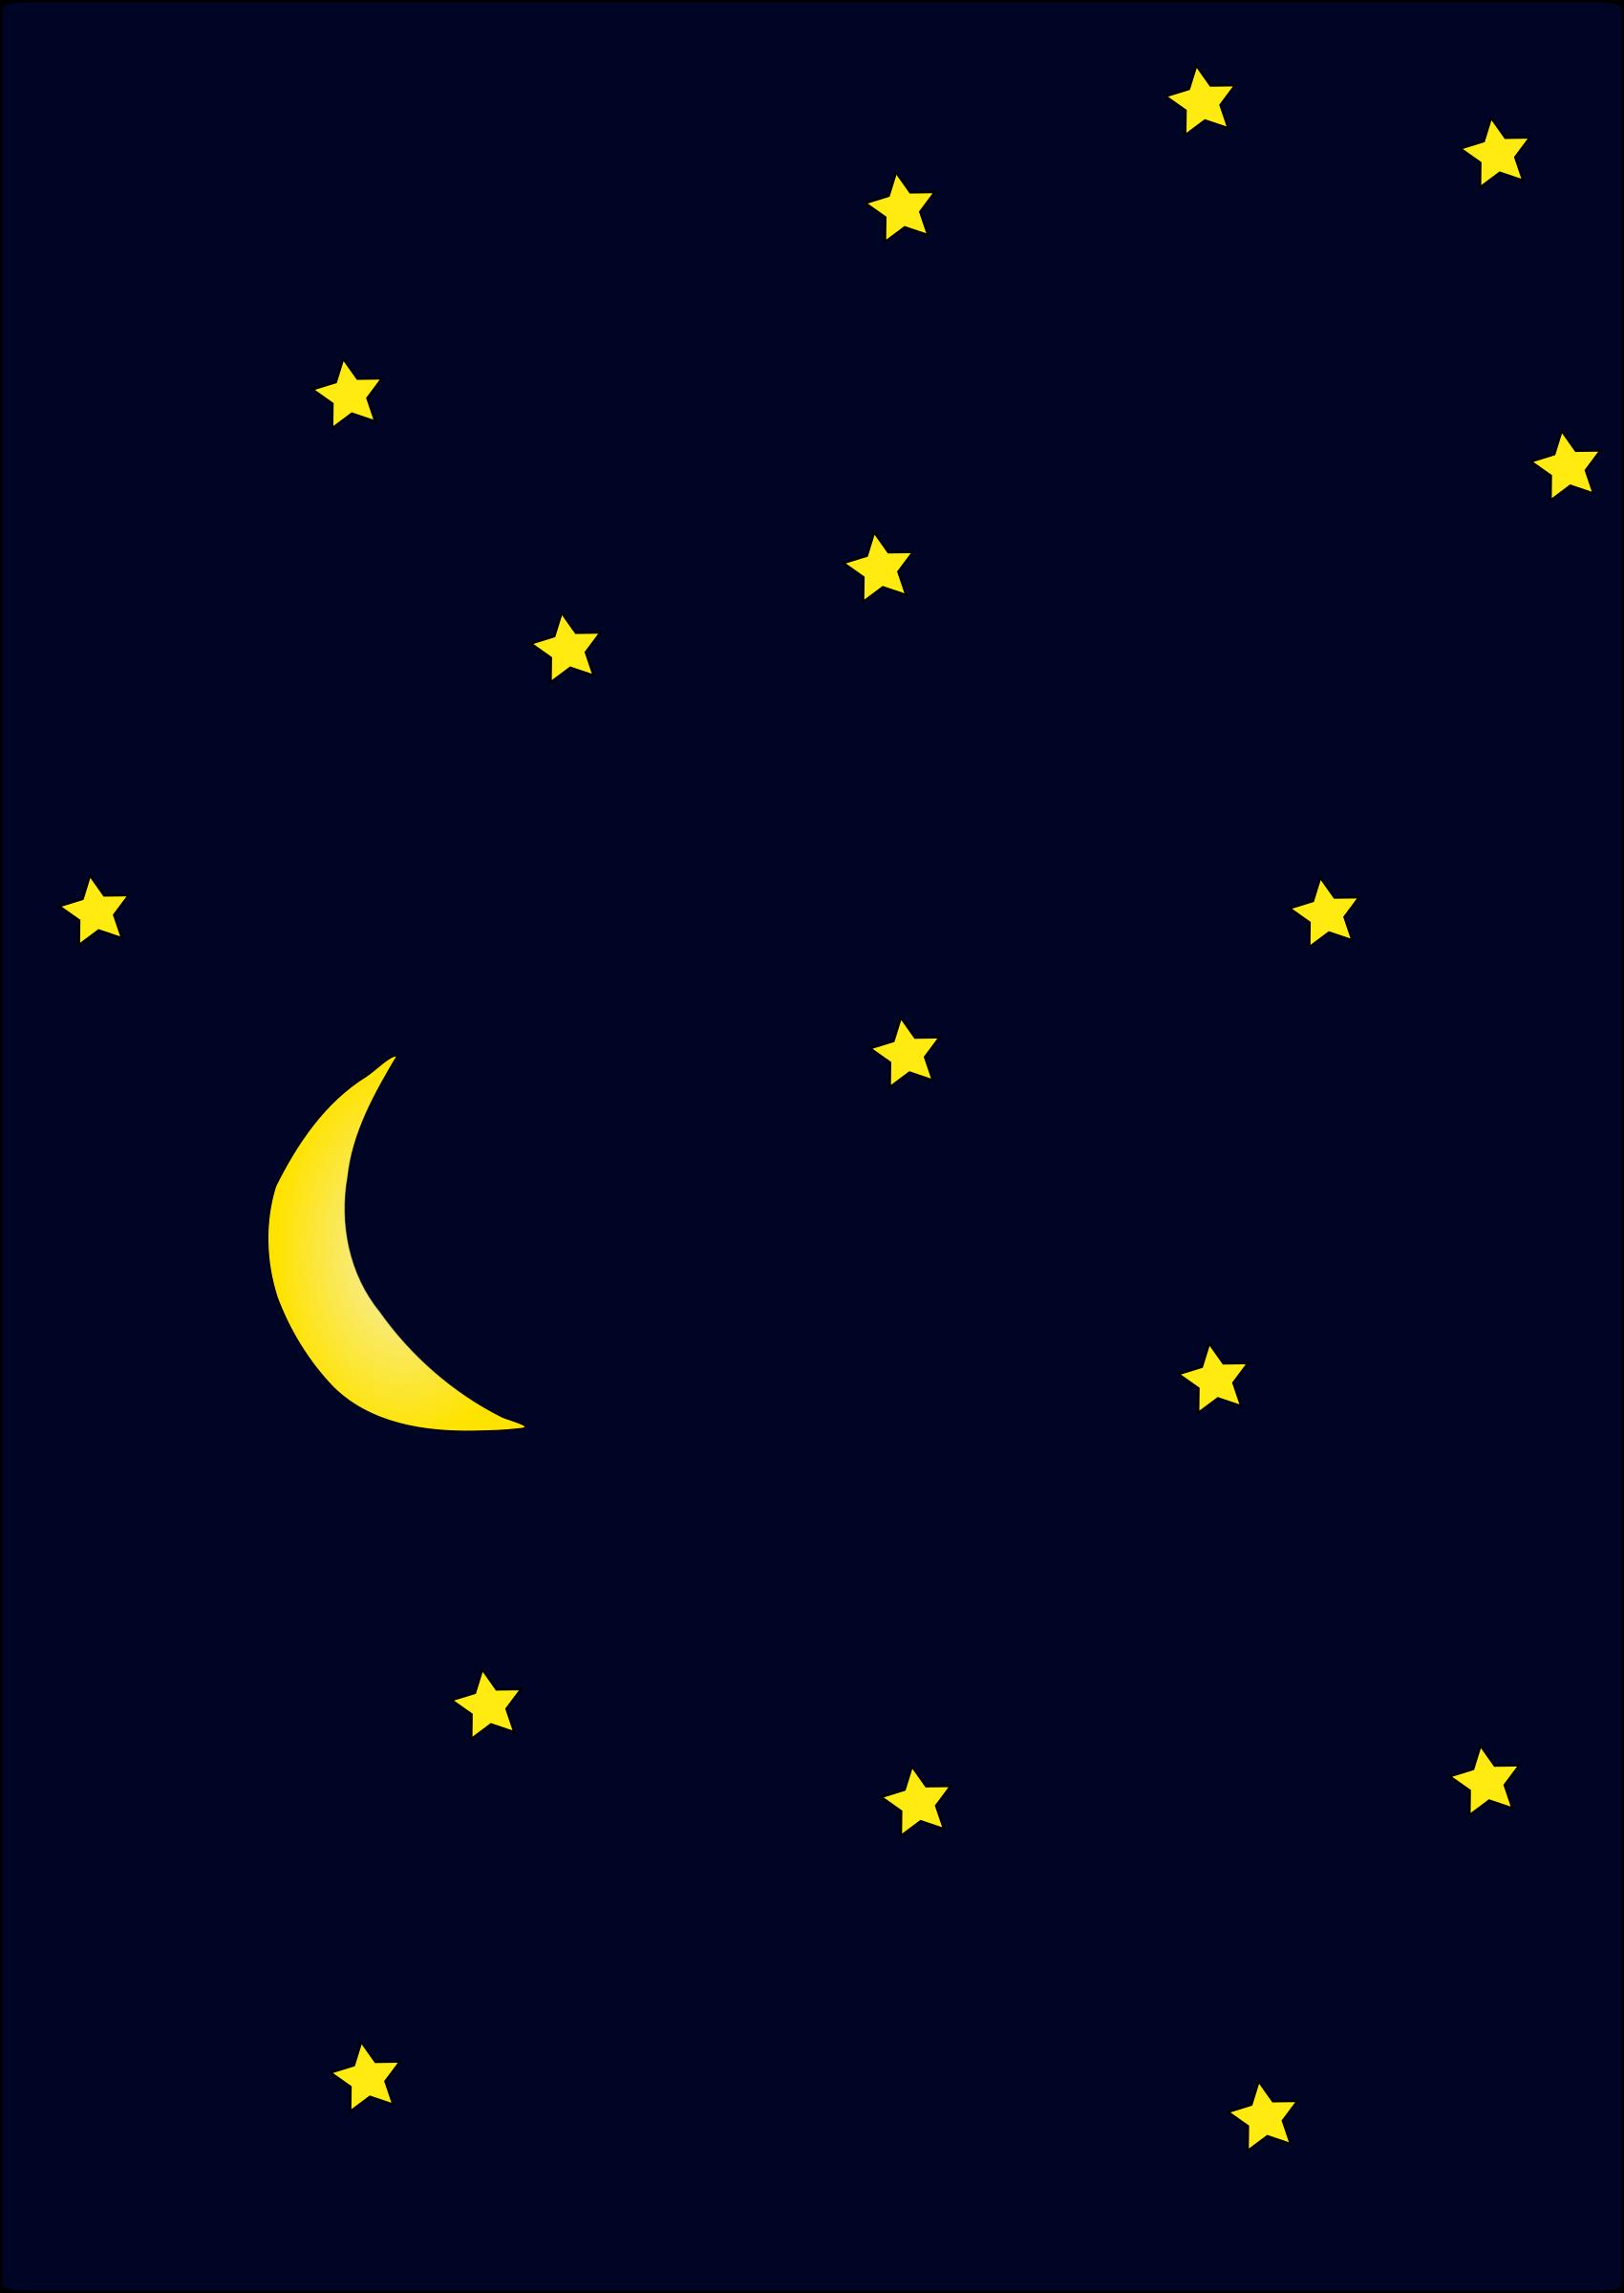 Free Night Stars Cliparts, Download Free Clip Art, Free Clip.